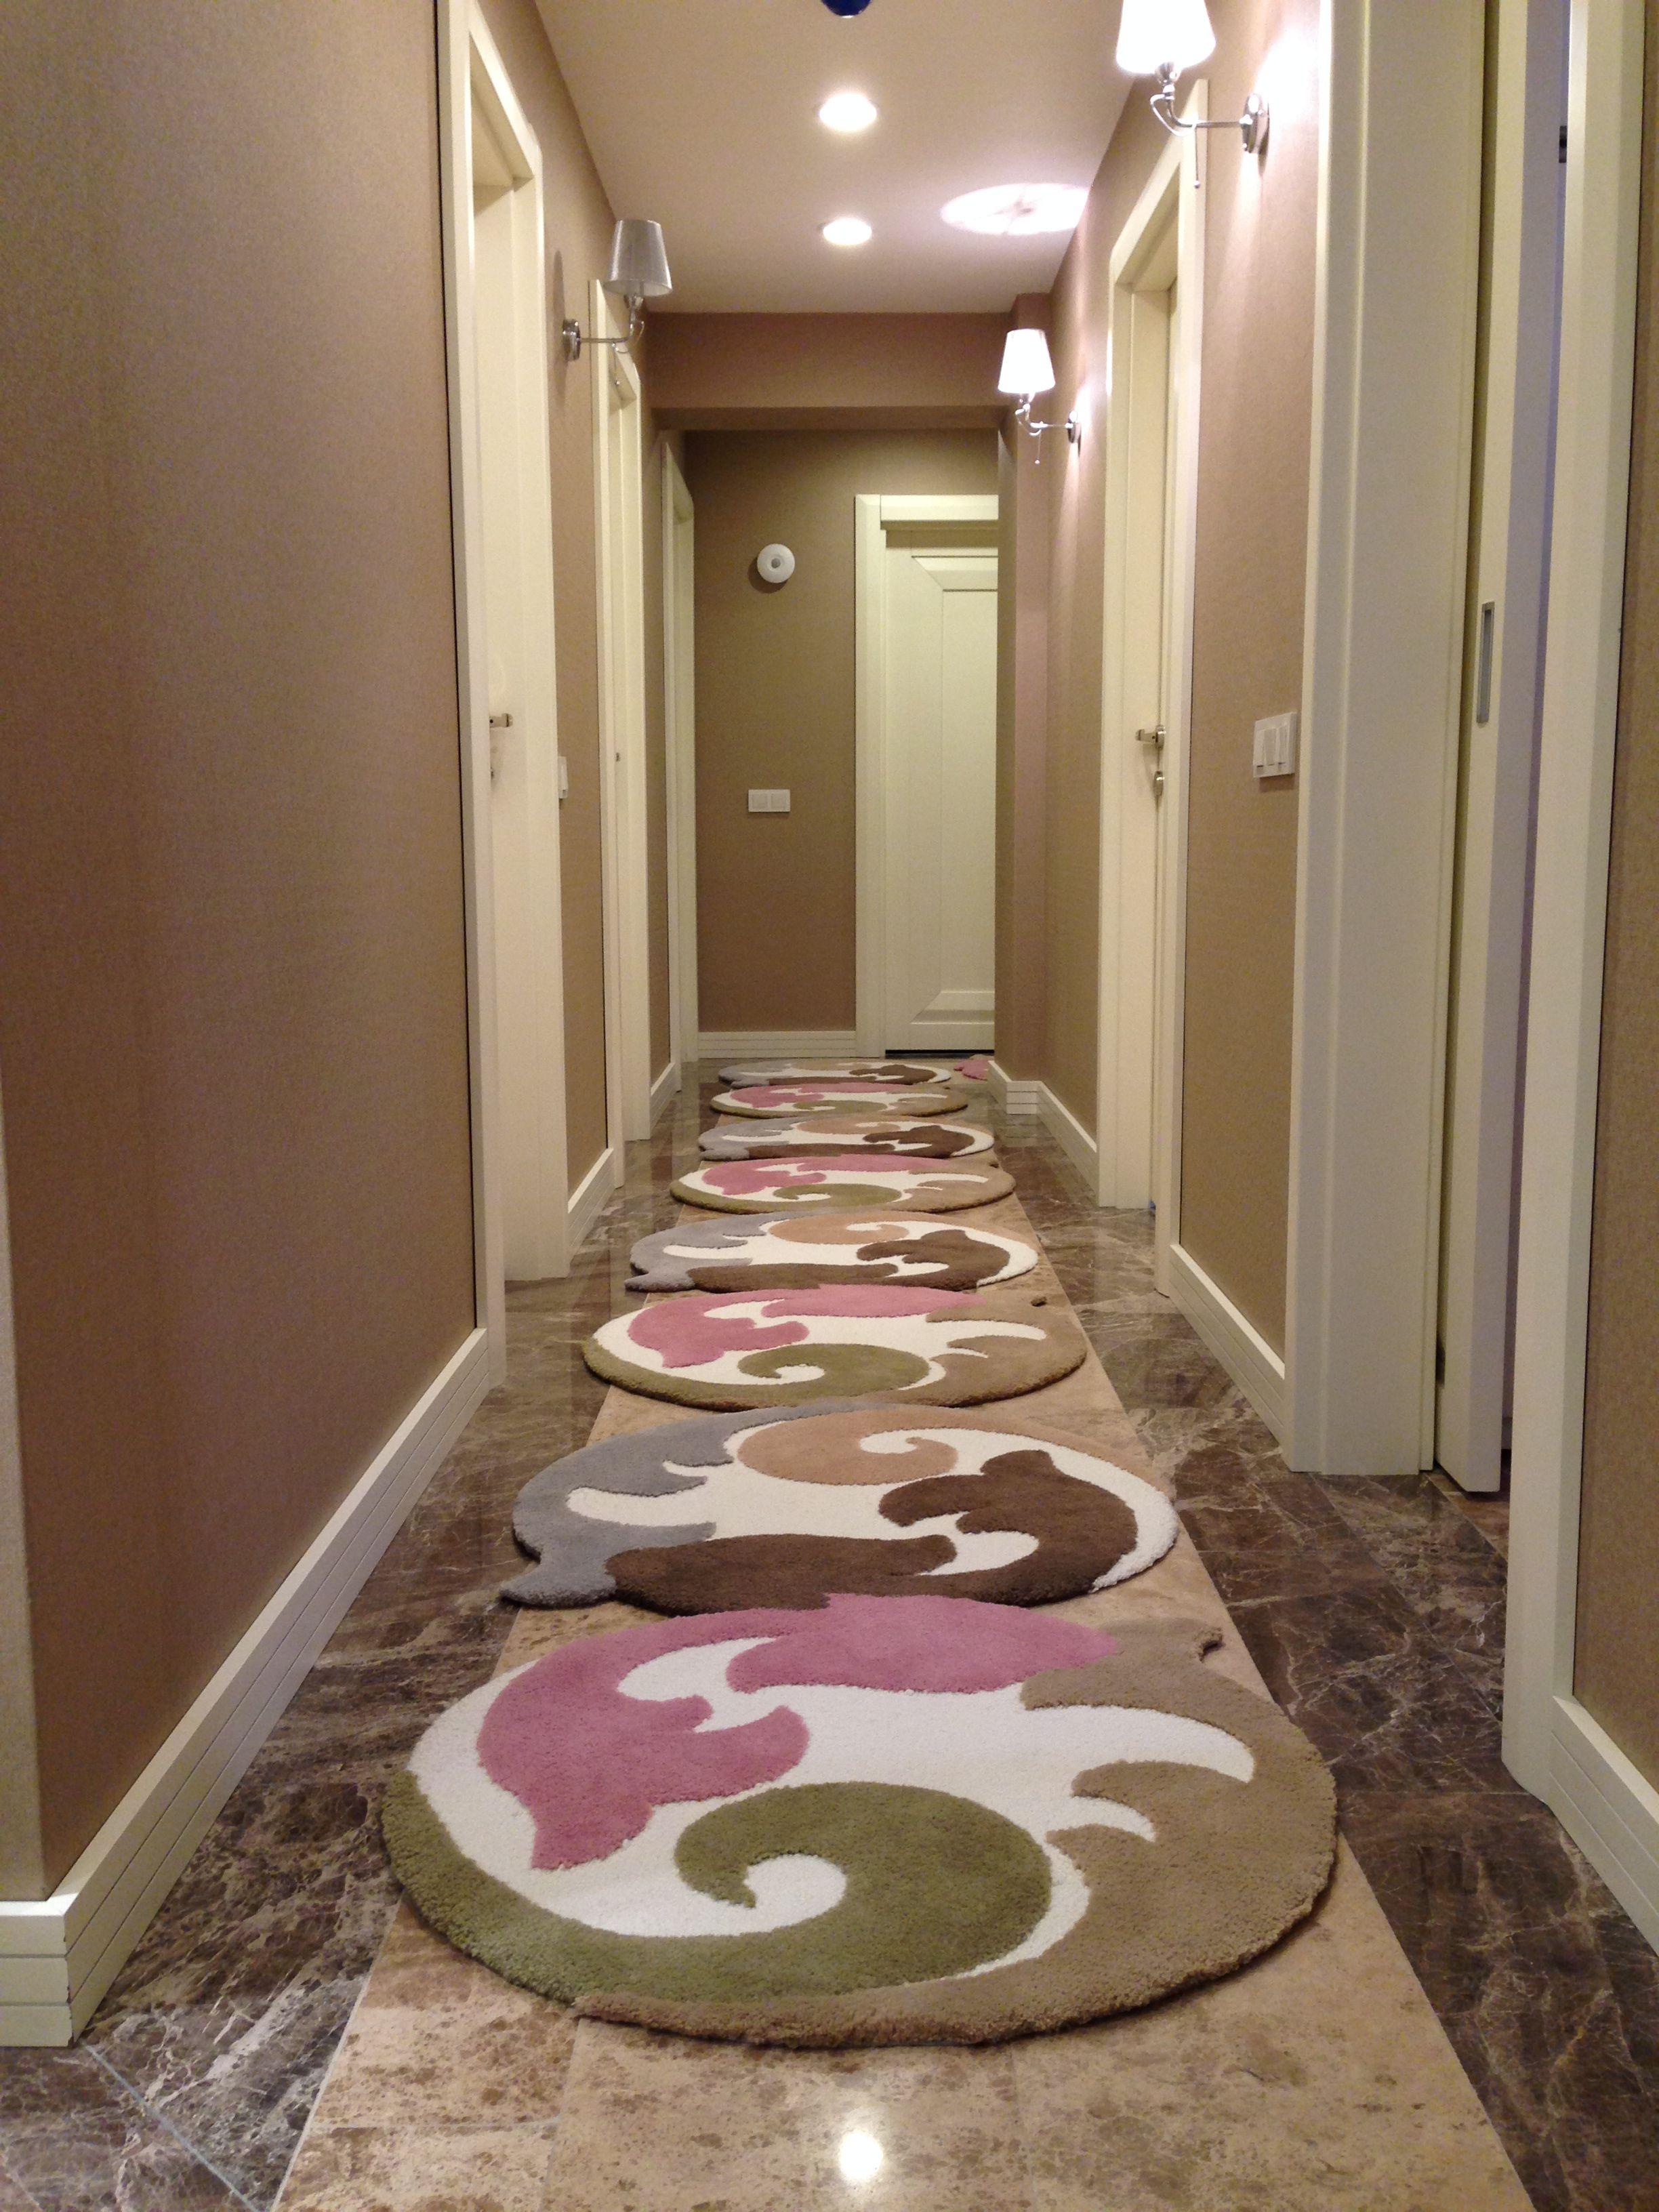 Saziye Hanimin Hol Halisi Hall Carpet Decor Home Decor Bow Pillows